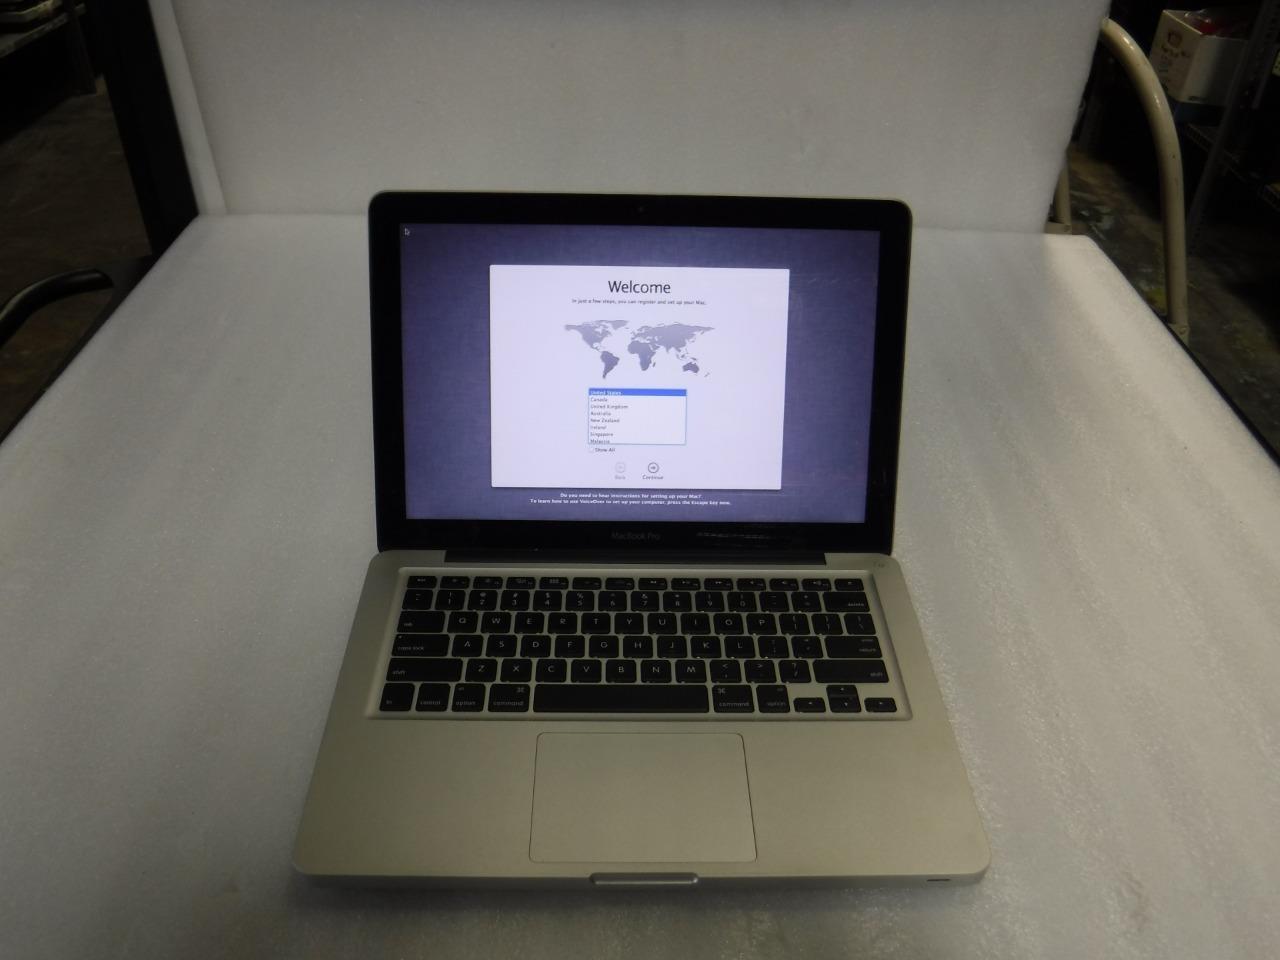 Apple MacBook Pro A1278 OSX Intel Core i5-3210m@ 2 50GHz 4GB 500GB